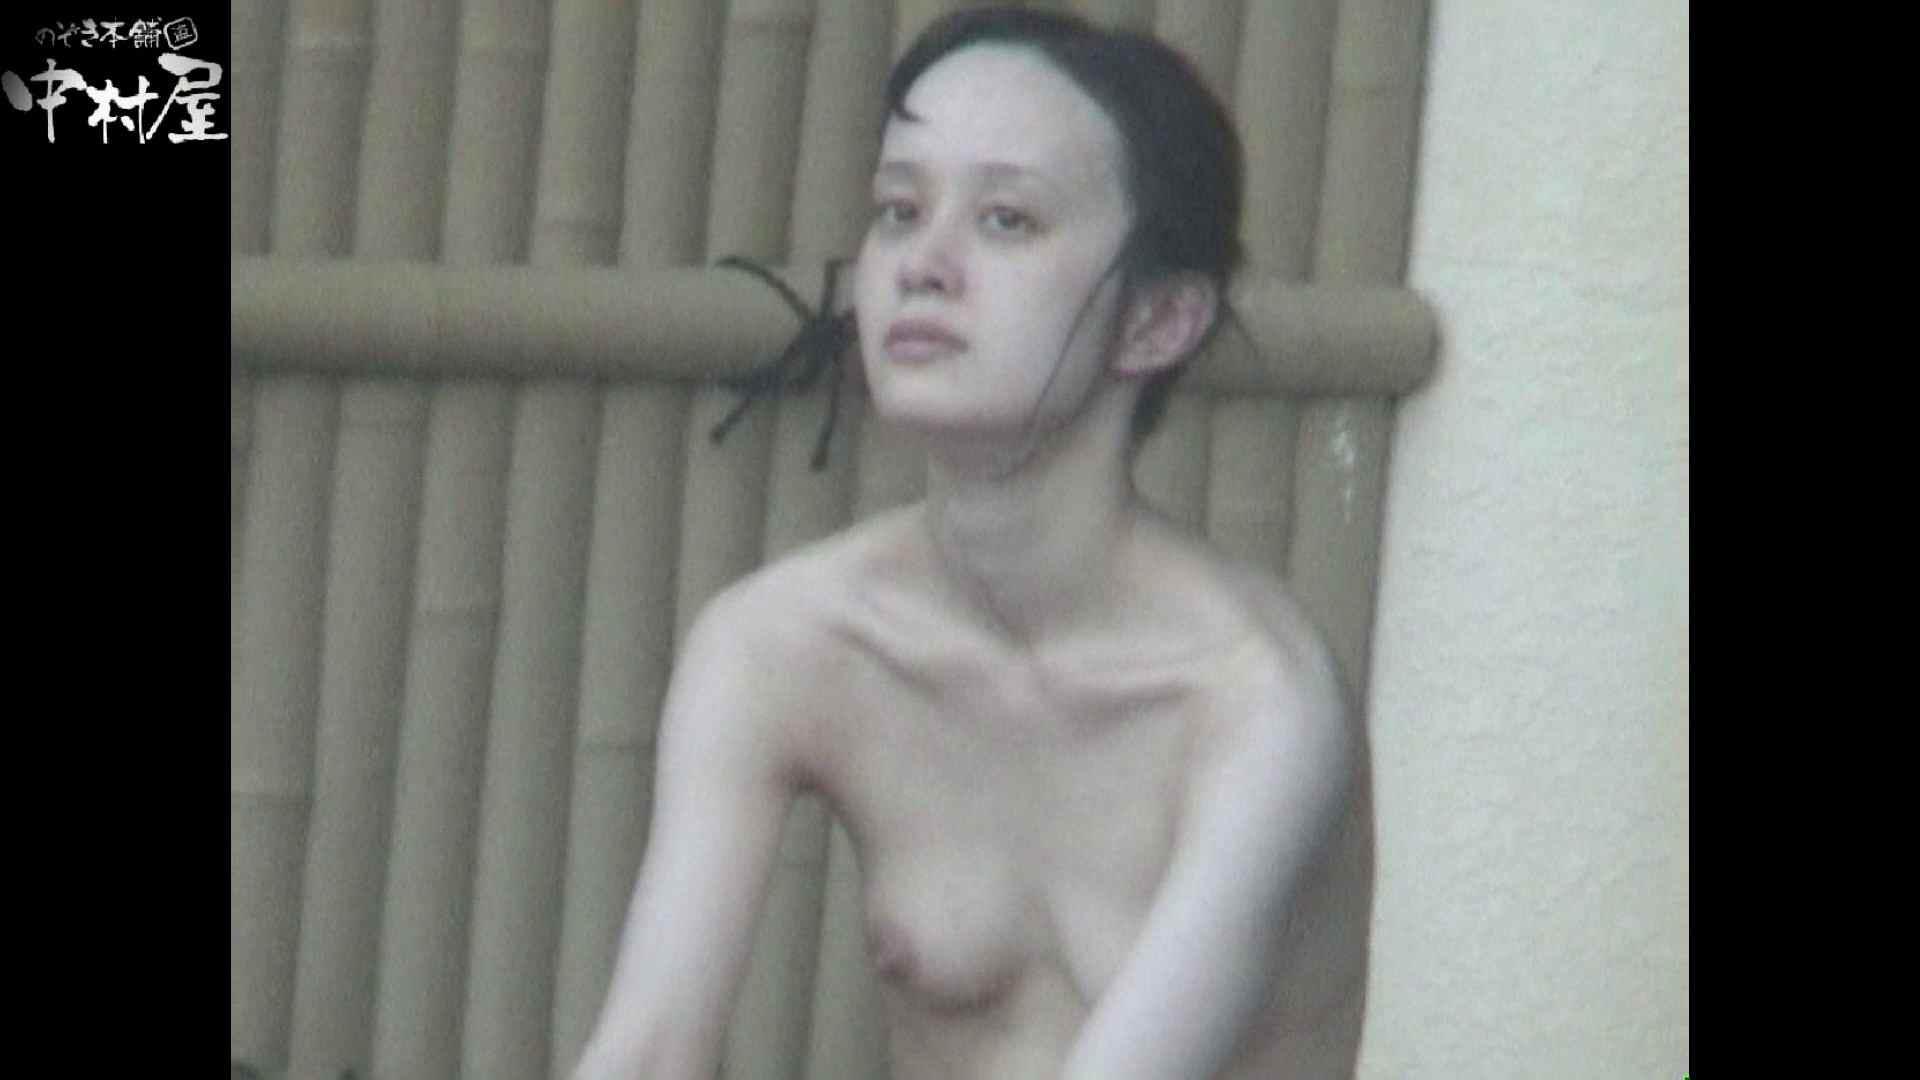 Aquaな露天風呂Vol.973 美しいOLの裸体 性交動画流出 95pic 5